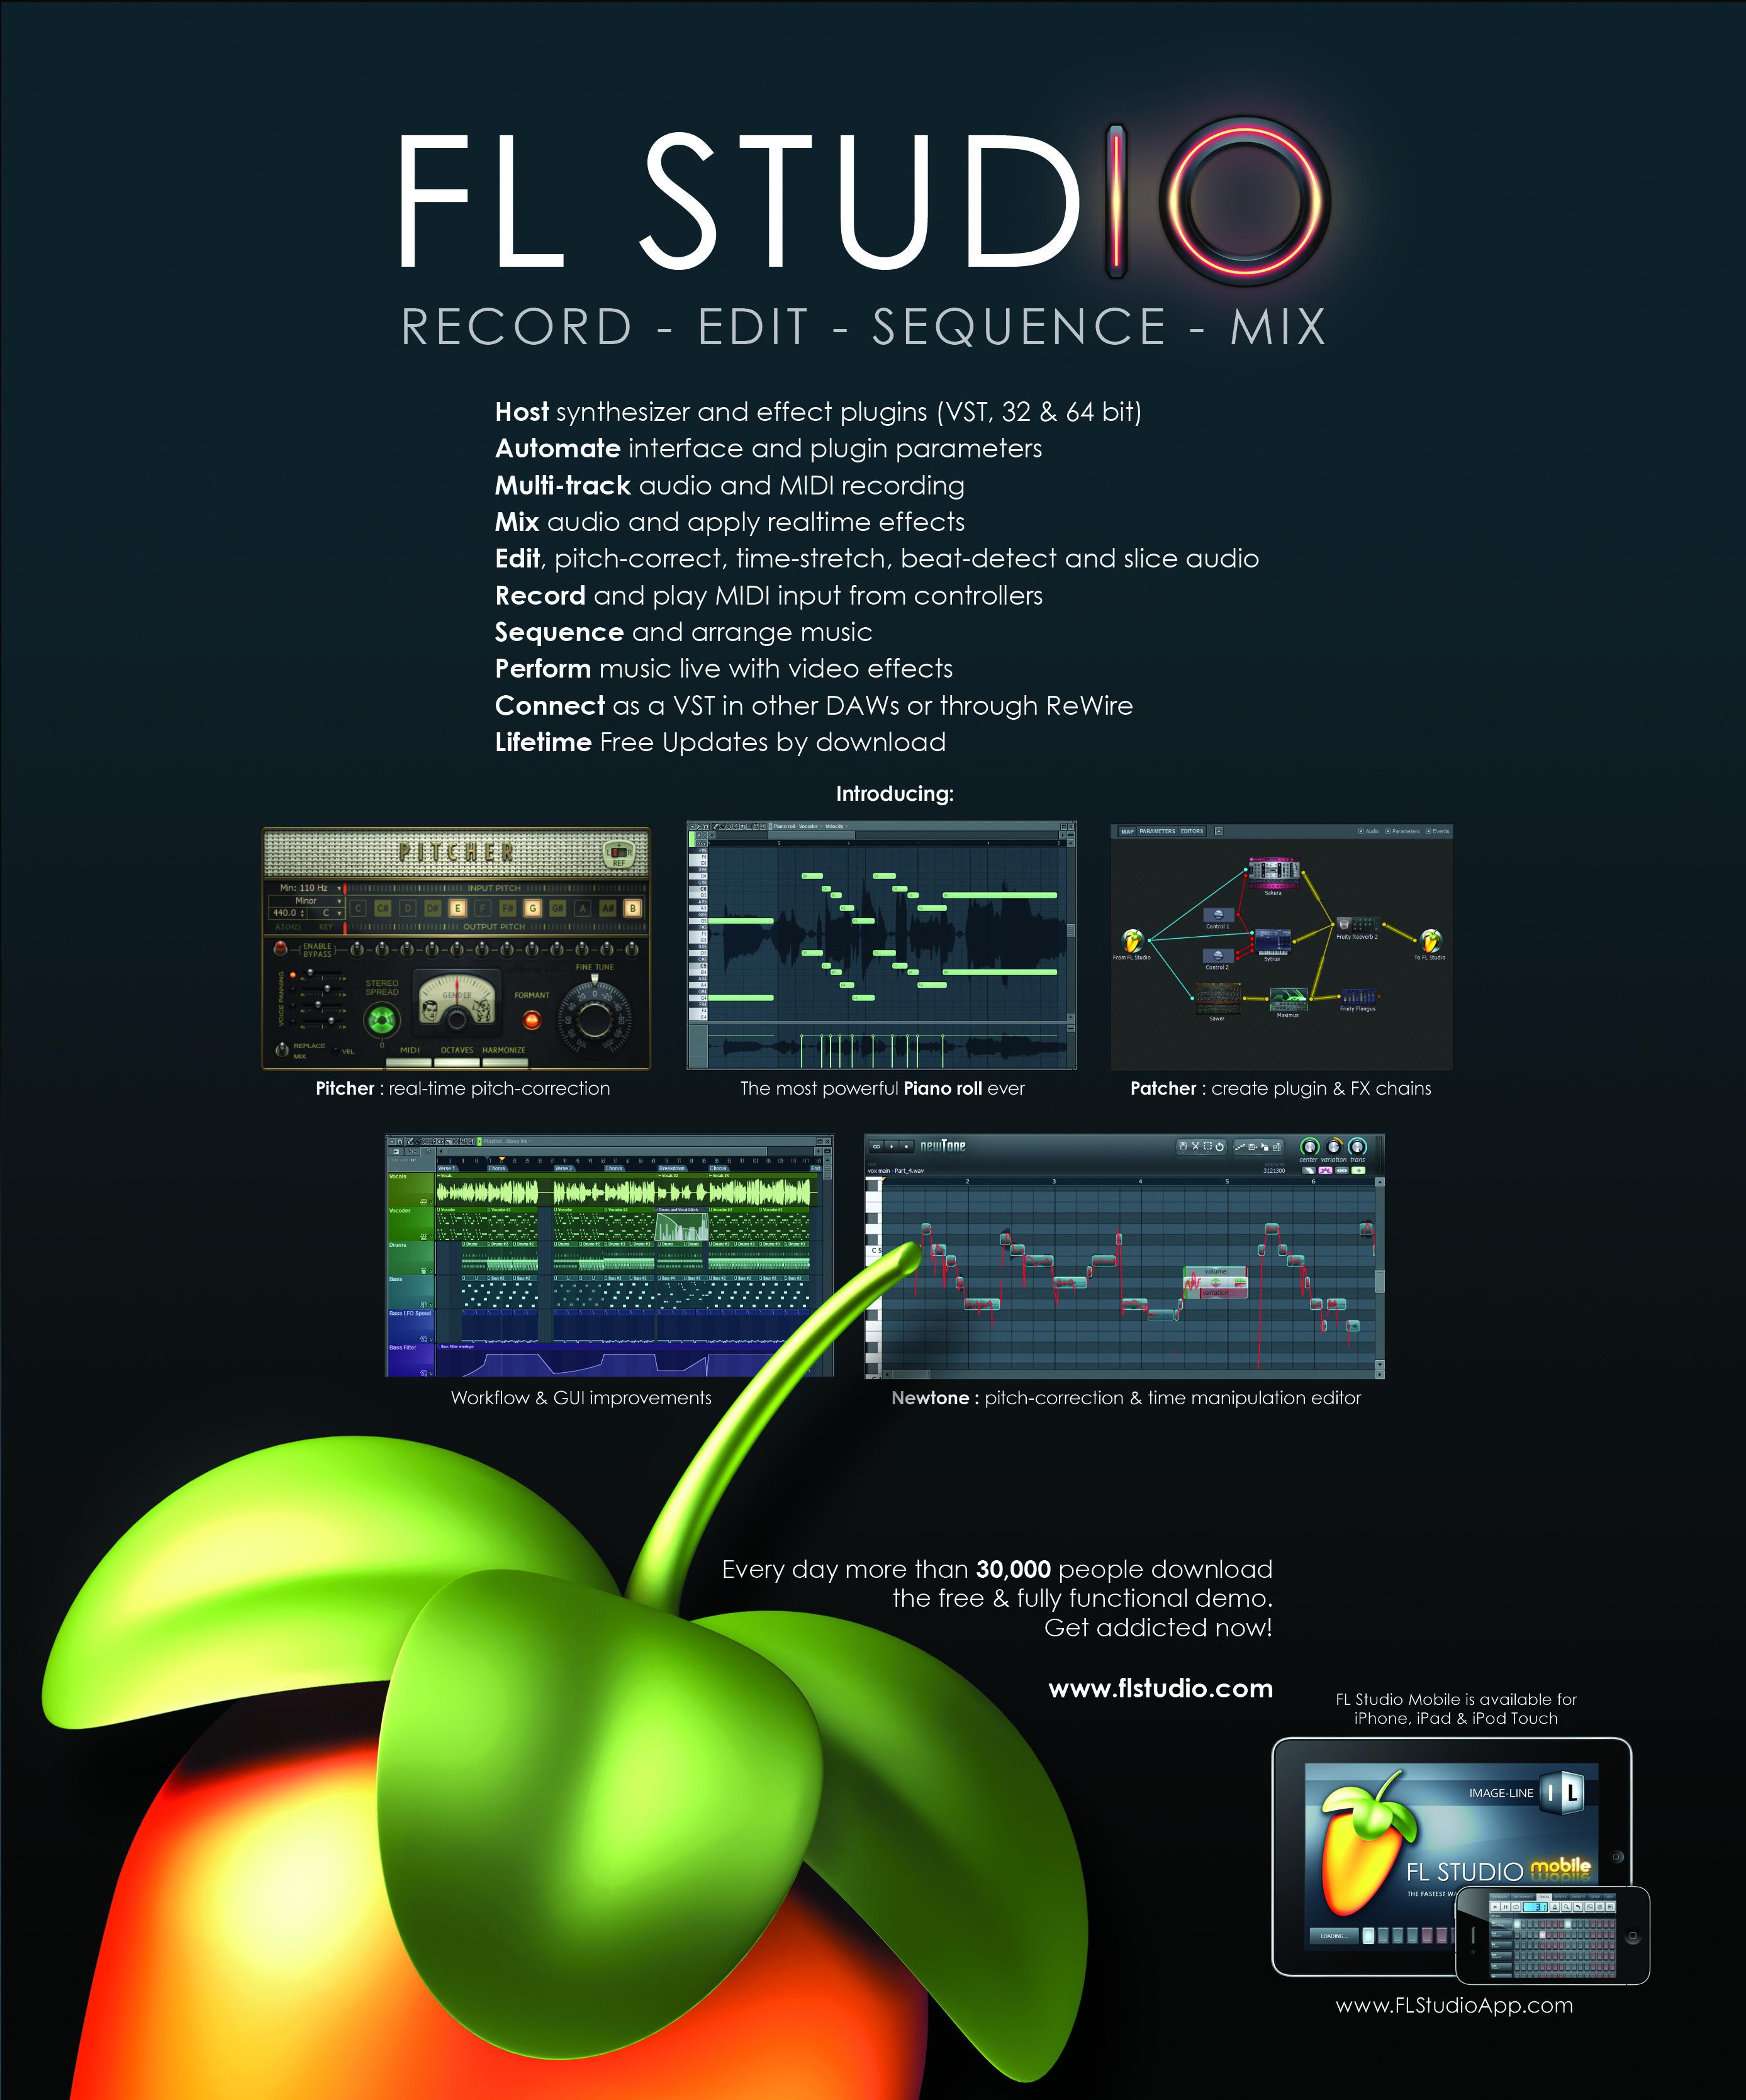 Frutty Loops Studio/FL Studio 10.0.8 Final Producer Edition English